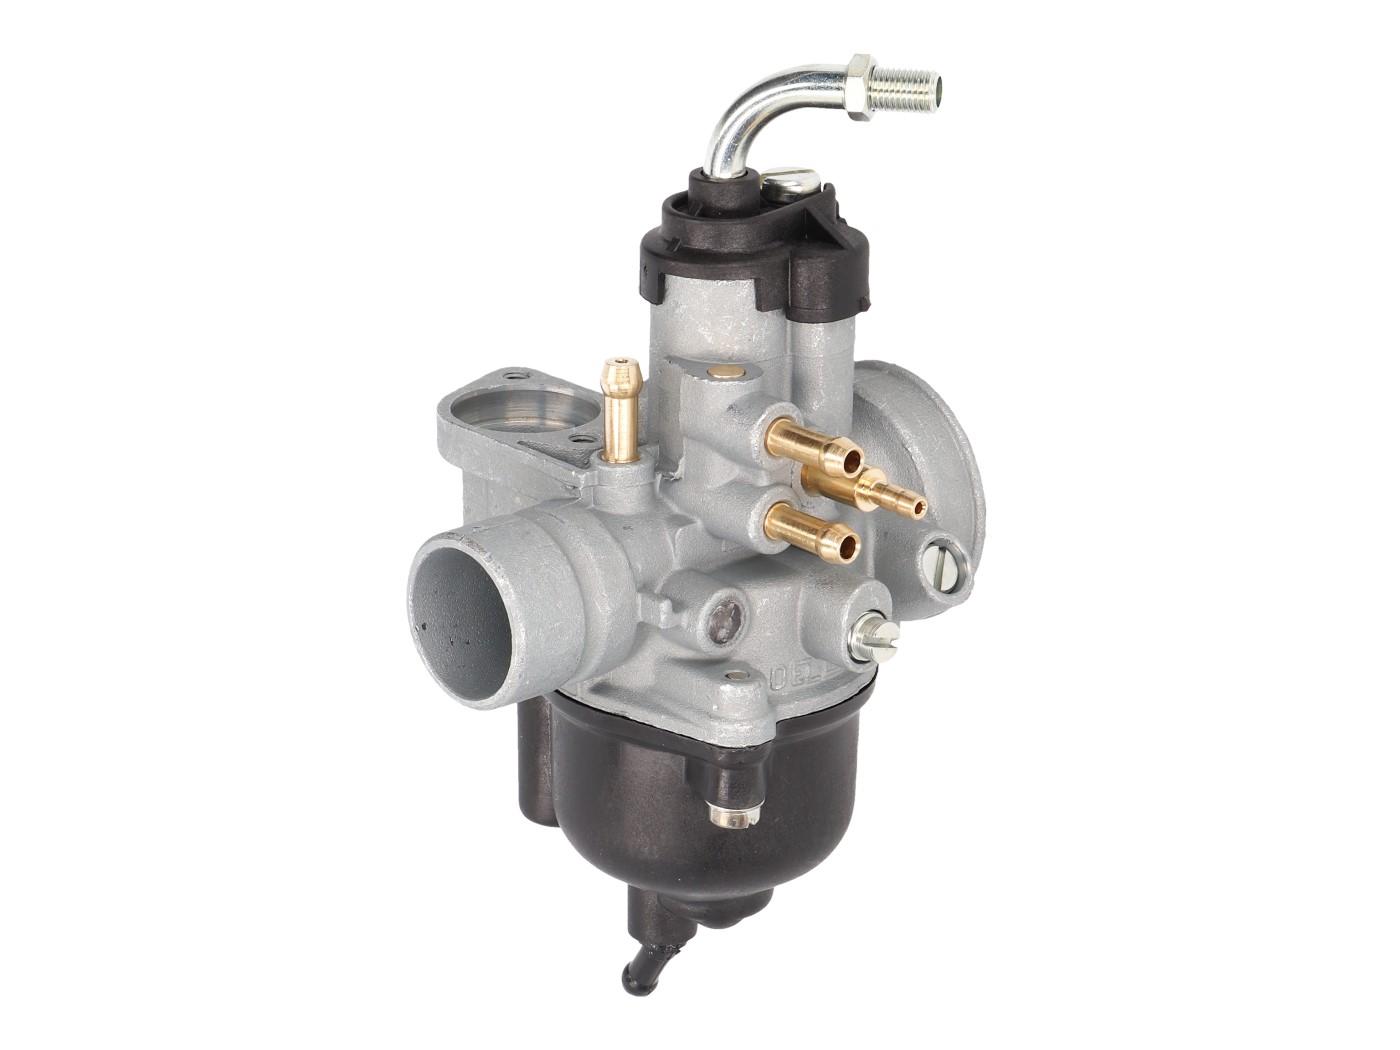 carburetor Dellorto PHVA 17 5mm TS for Minarelli, Peugeot